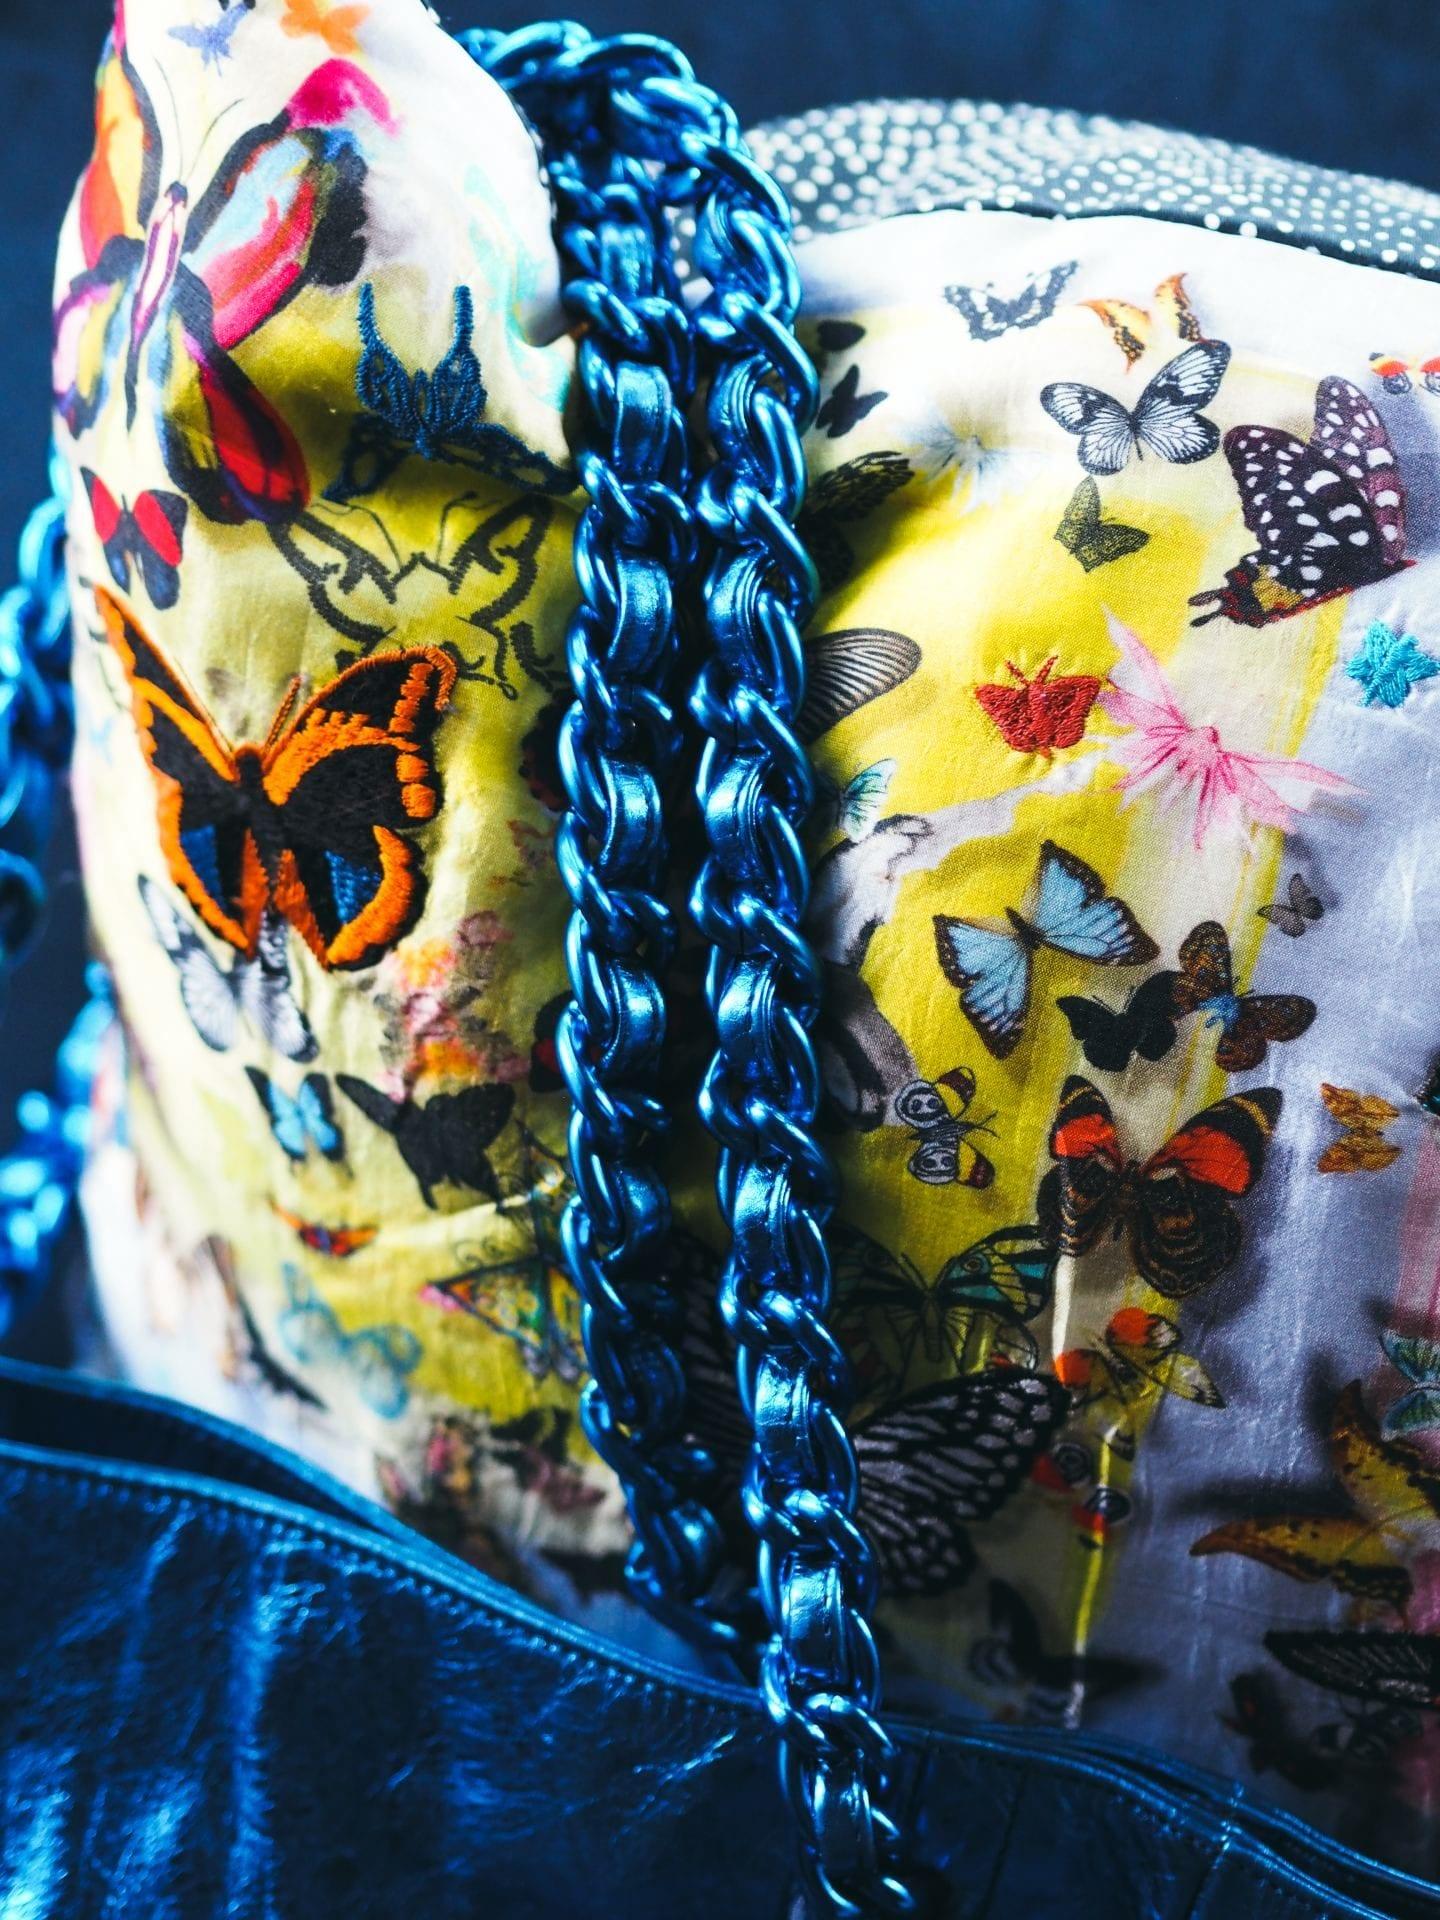 The Chanel Chain Tote Handbag At Auction blue metallic chain strap